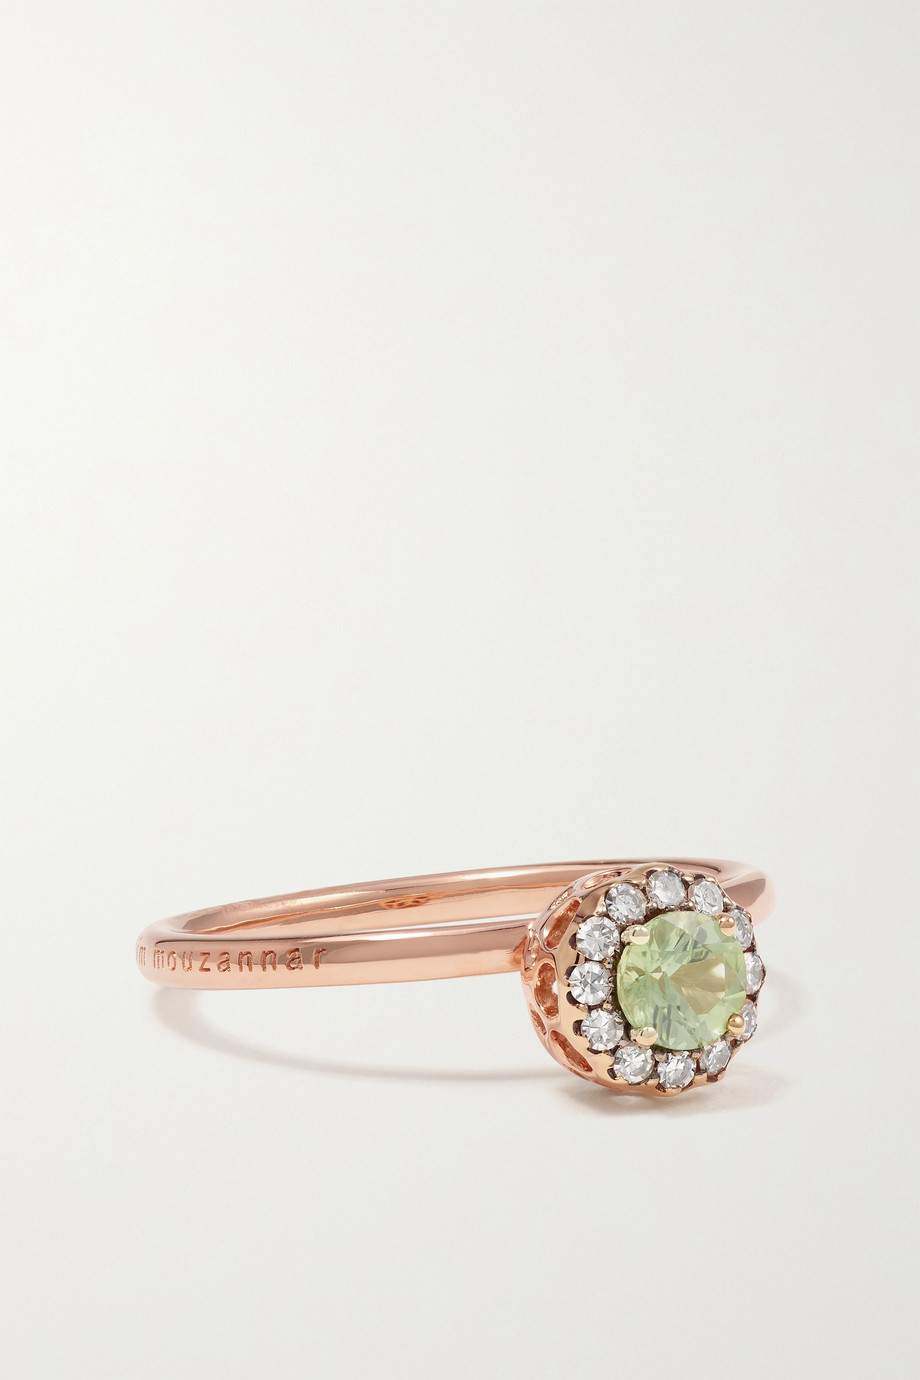 Selim Mouzannar Beirut 18-karat rose gold, tourmaline and diamond ring